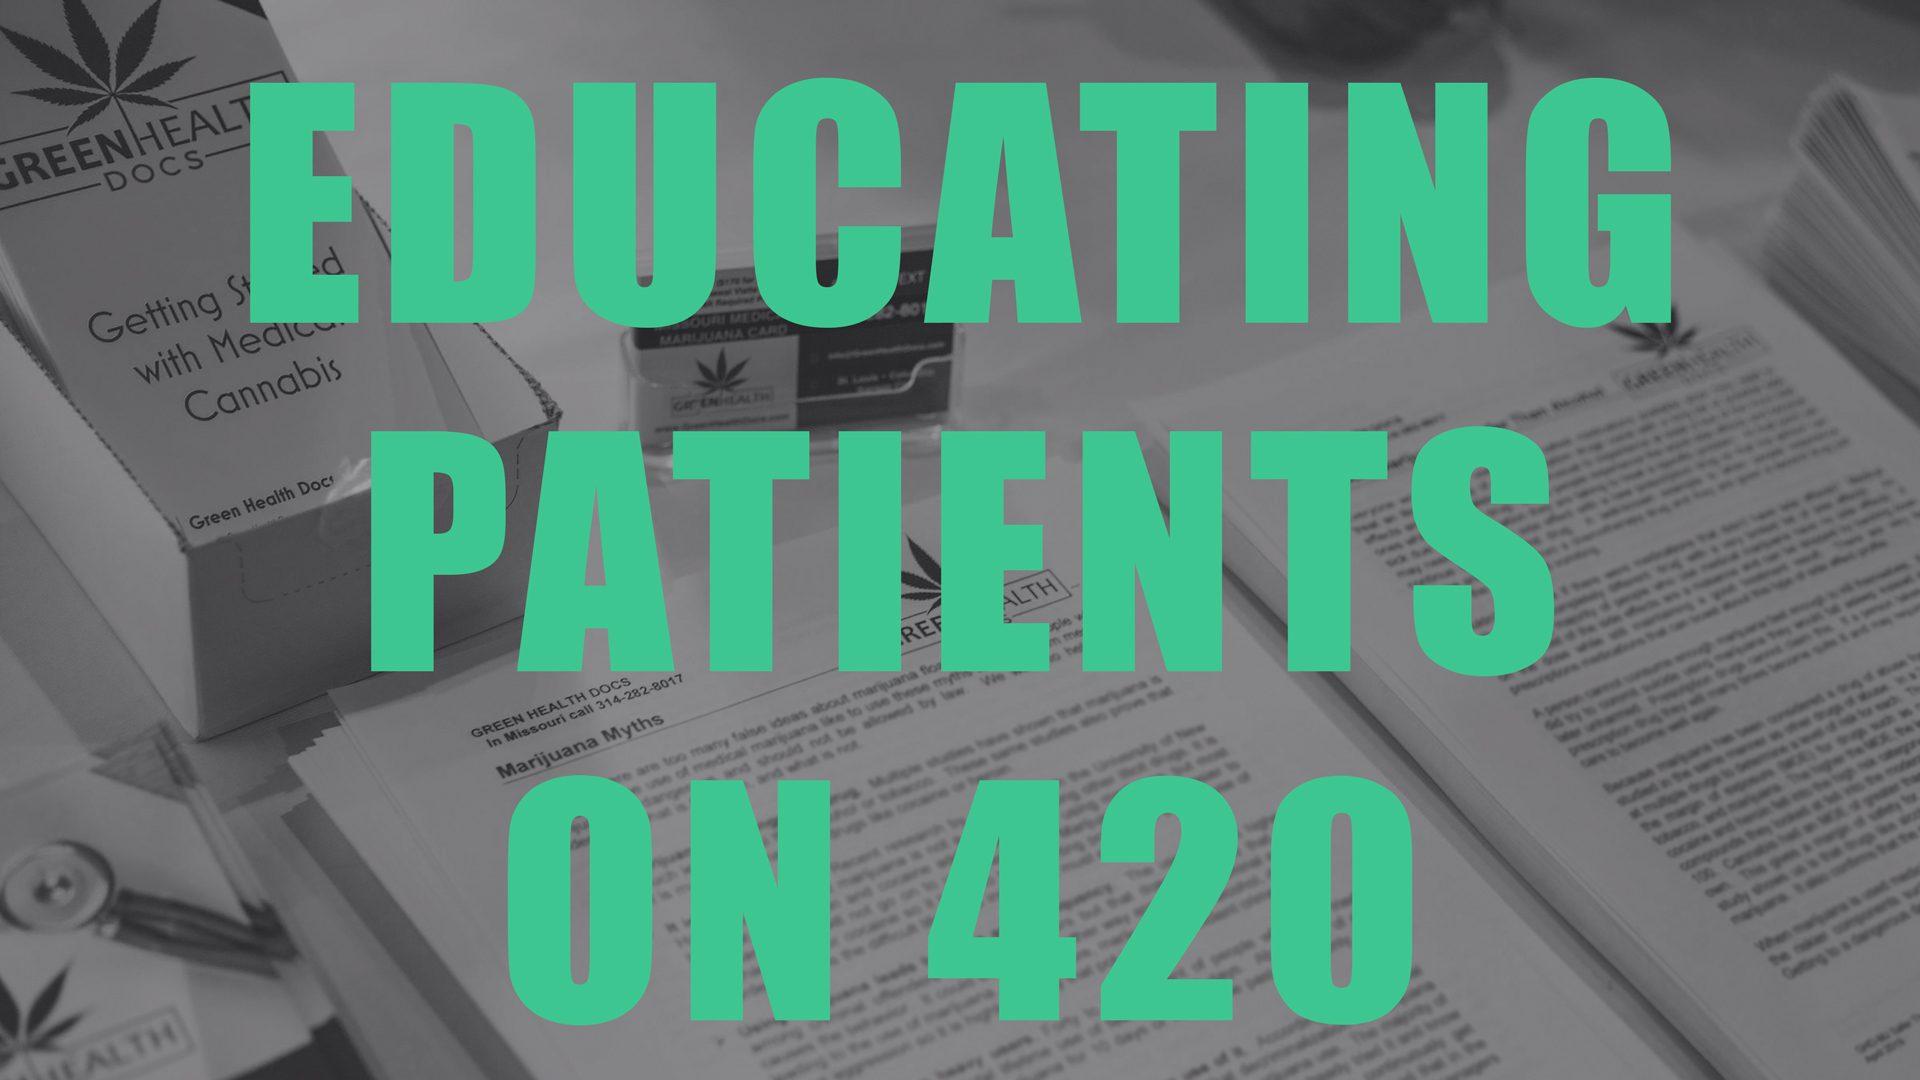 Educating420